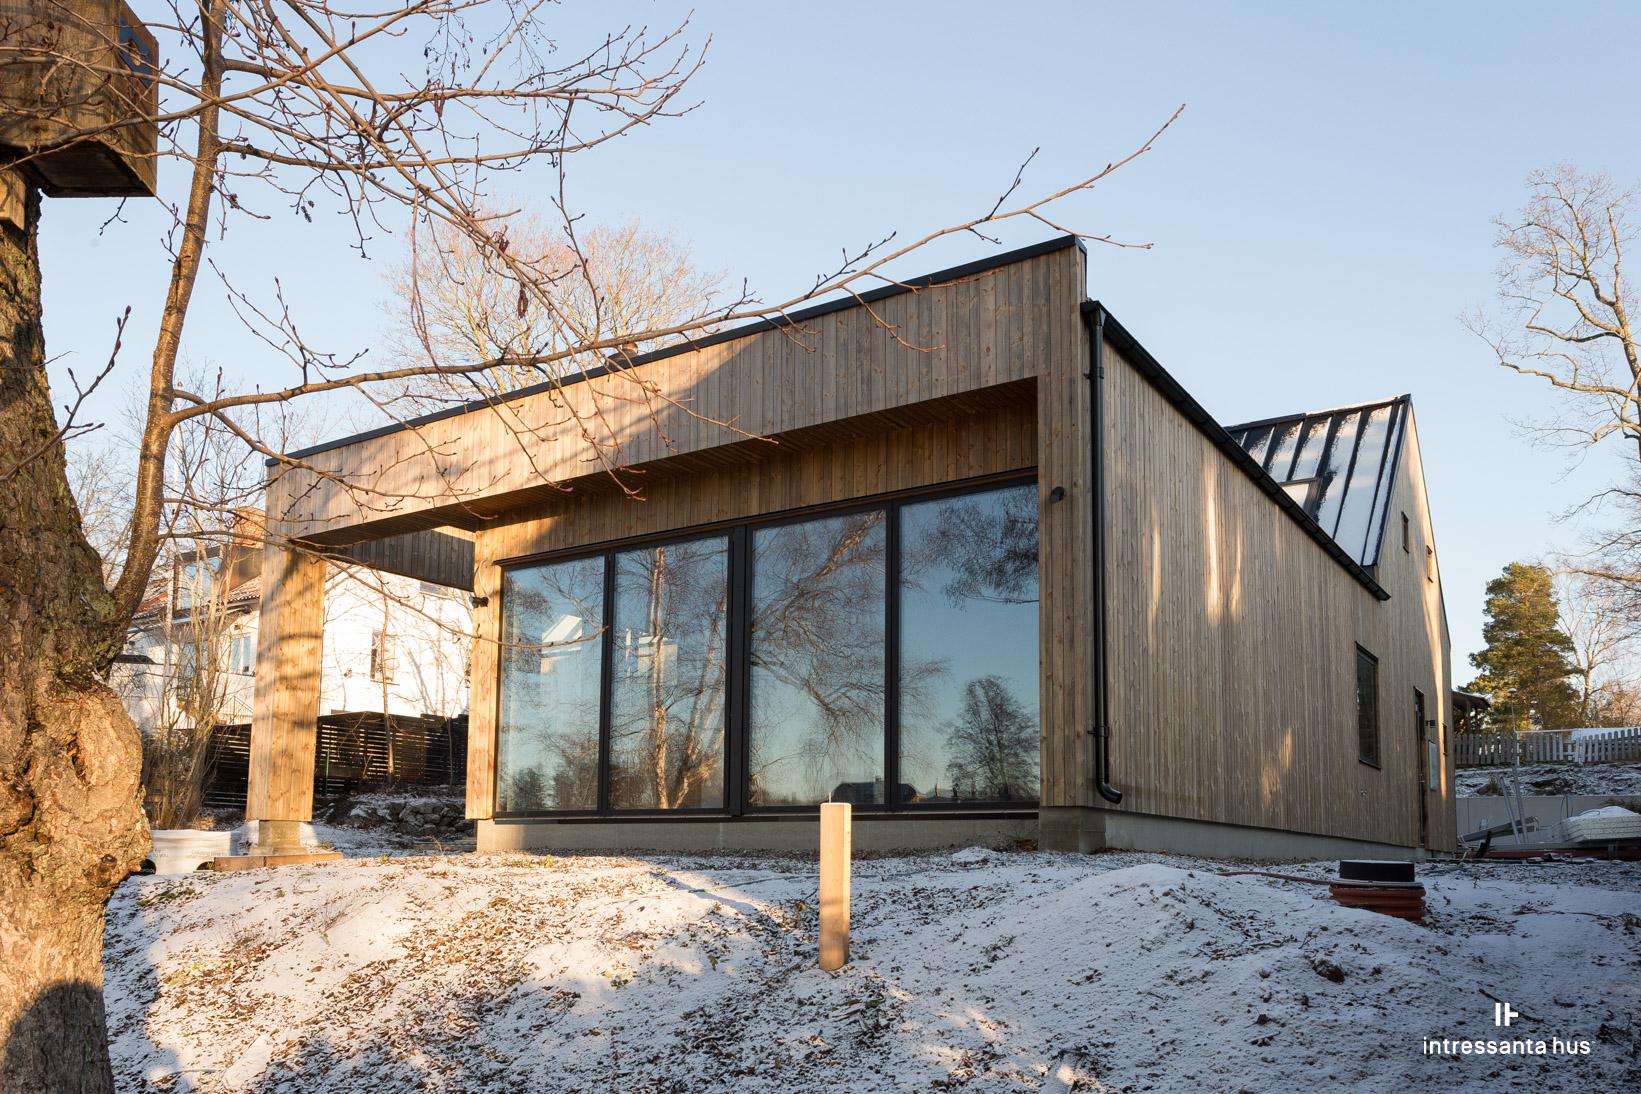 intressantahus-house1-027